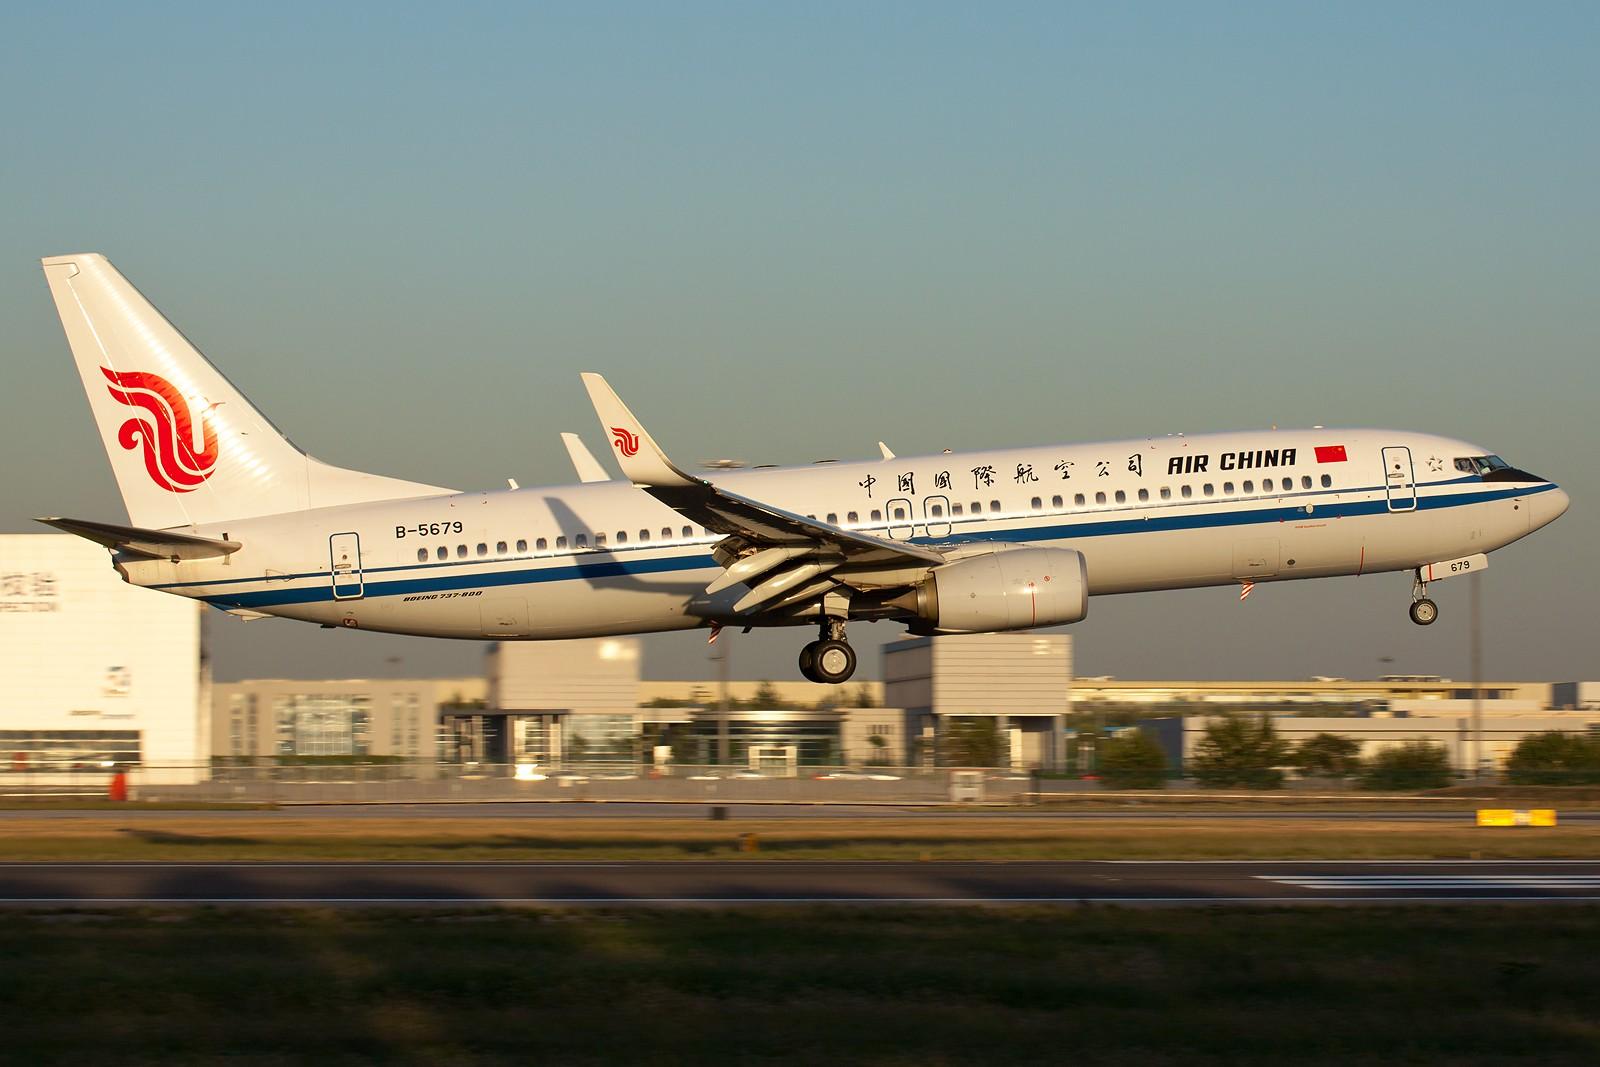 Re:[原创]国航一组 B737&A320系列 [10pics] BOEING 737-800 B-5679 中国北京首都机场